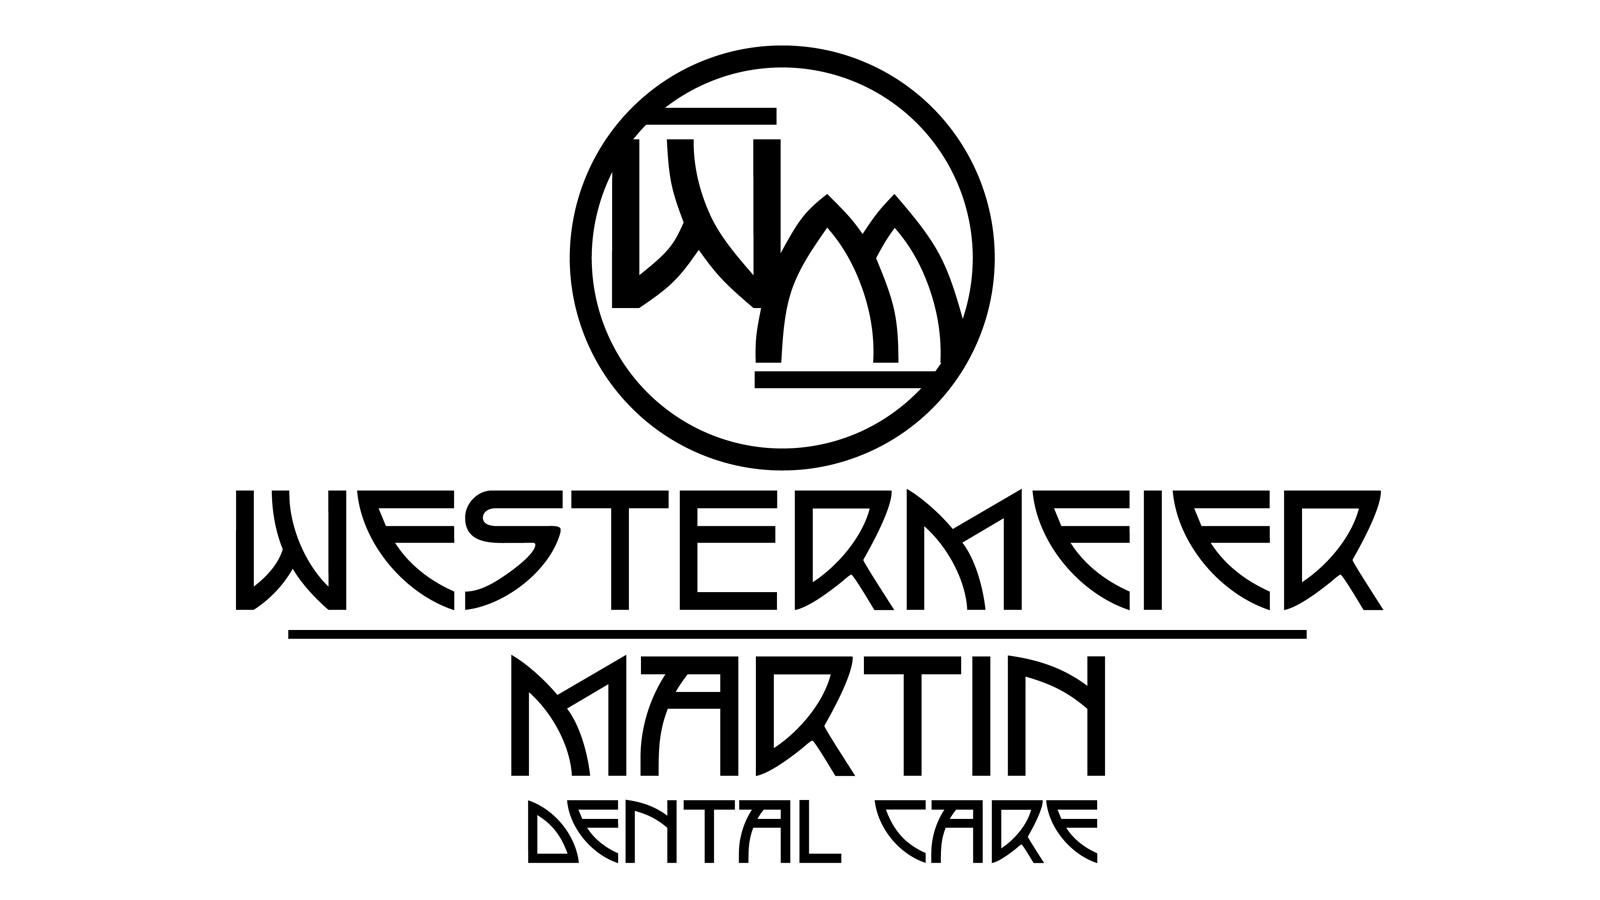 Westermeier Martin Dental Care